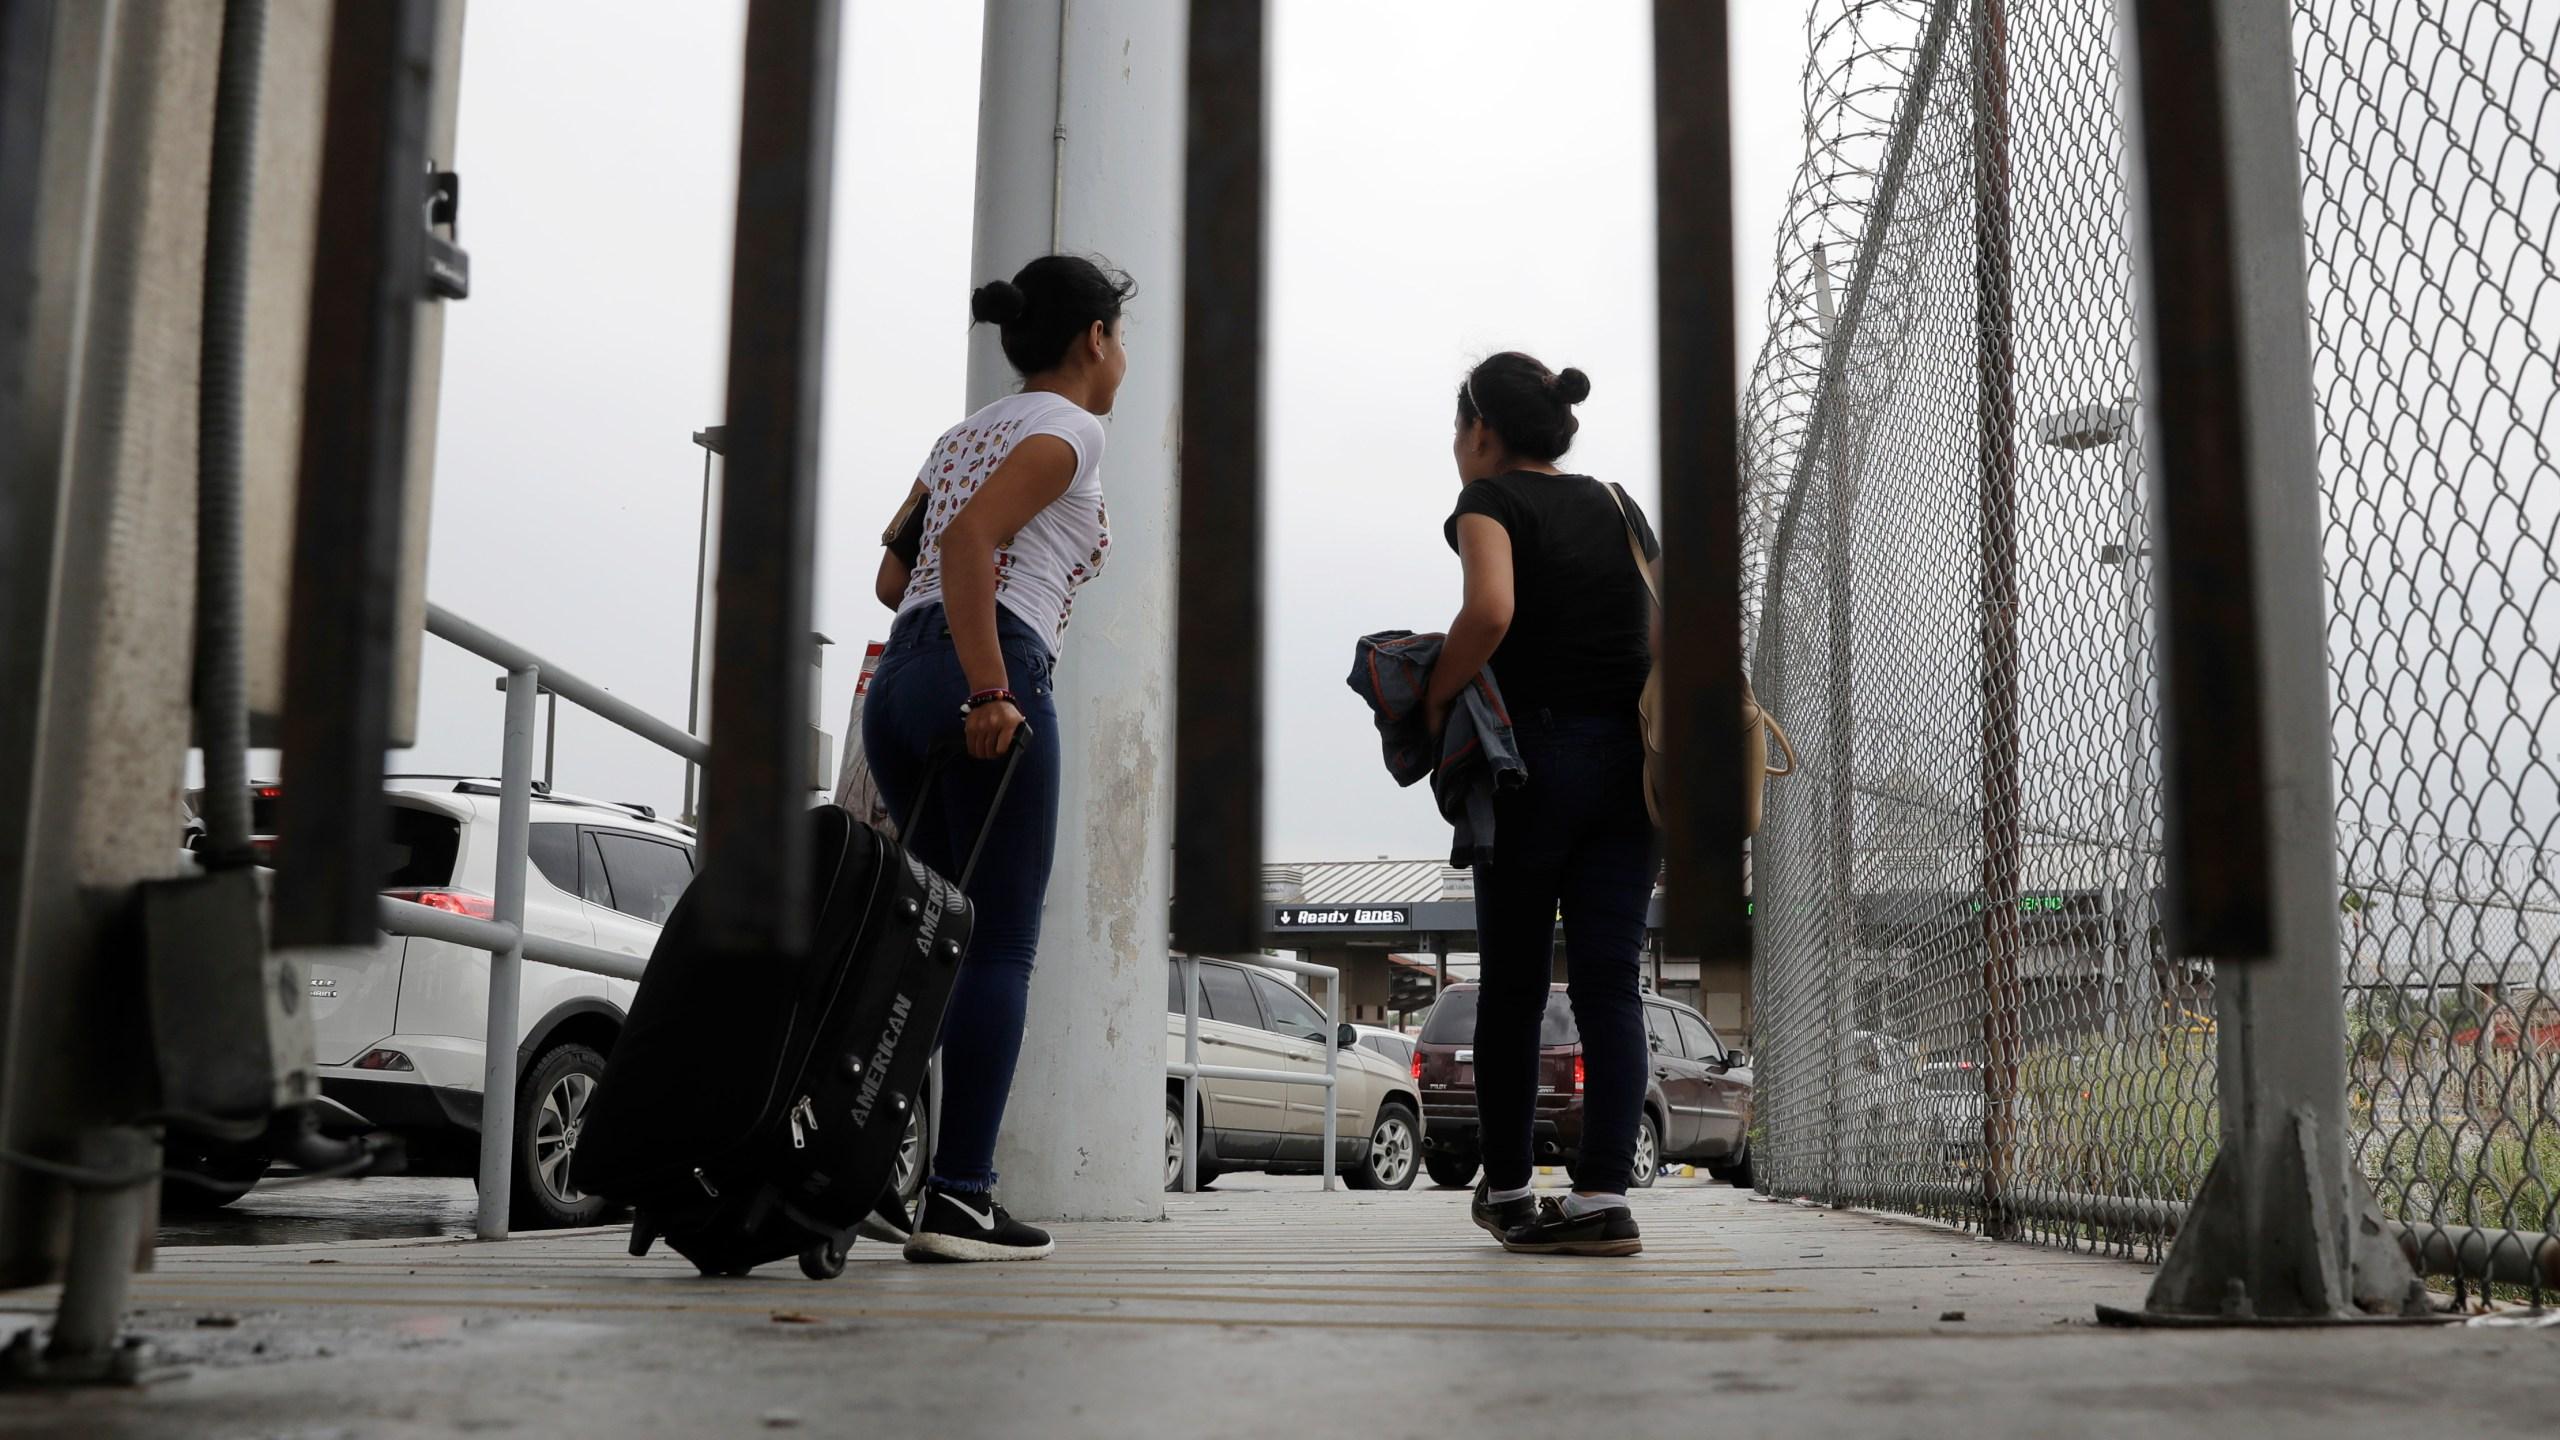 Immigration_Denying_Asylum_50195-159532.jpg40635800